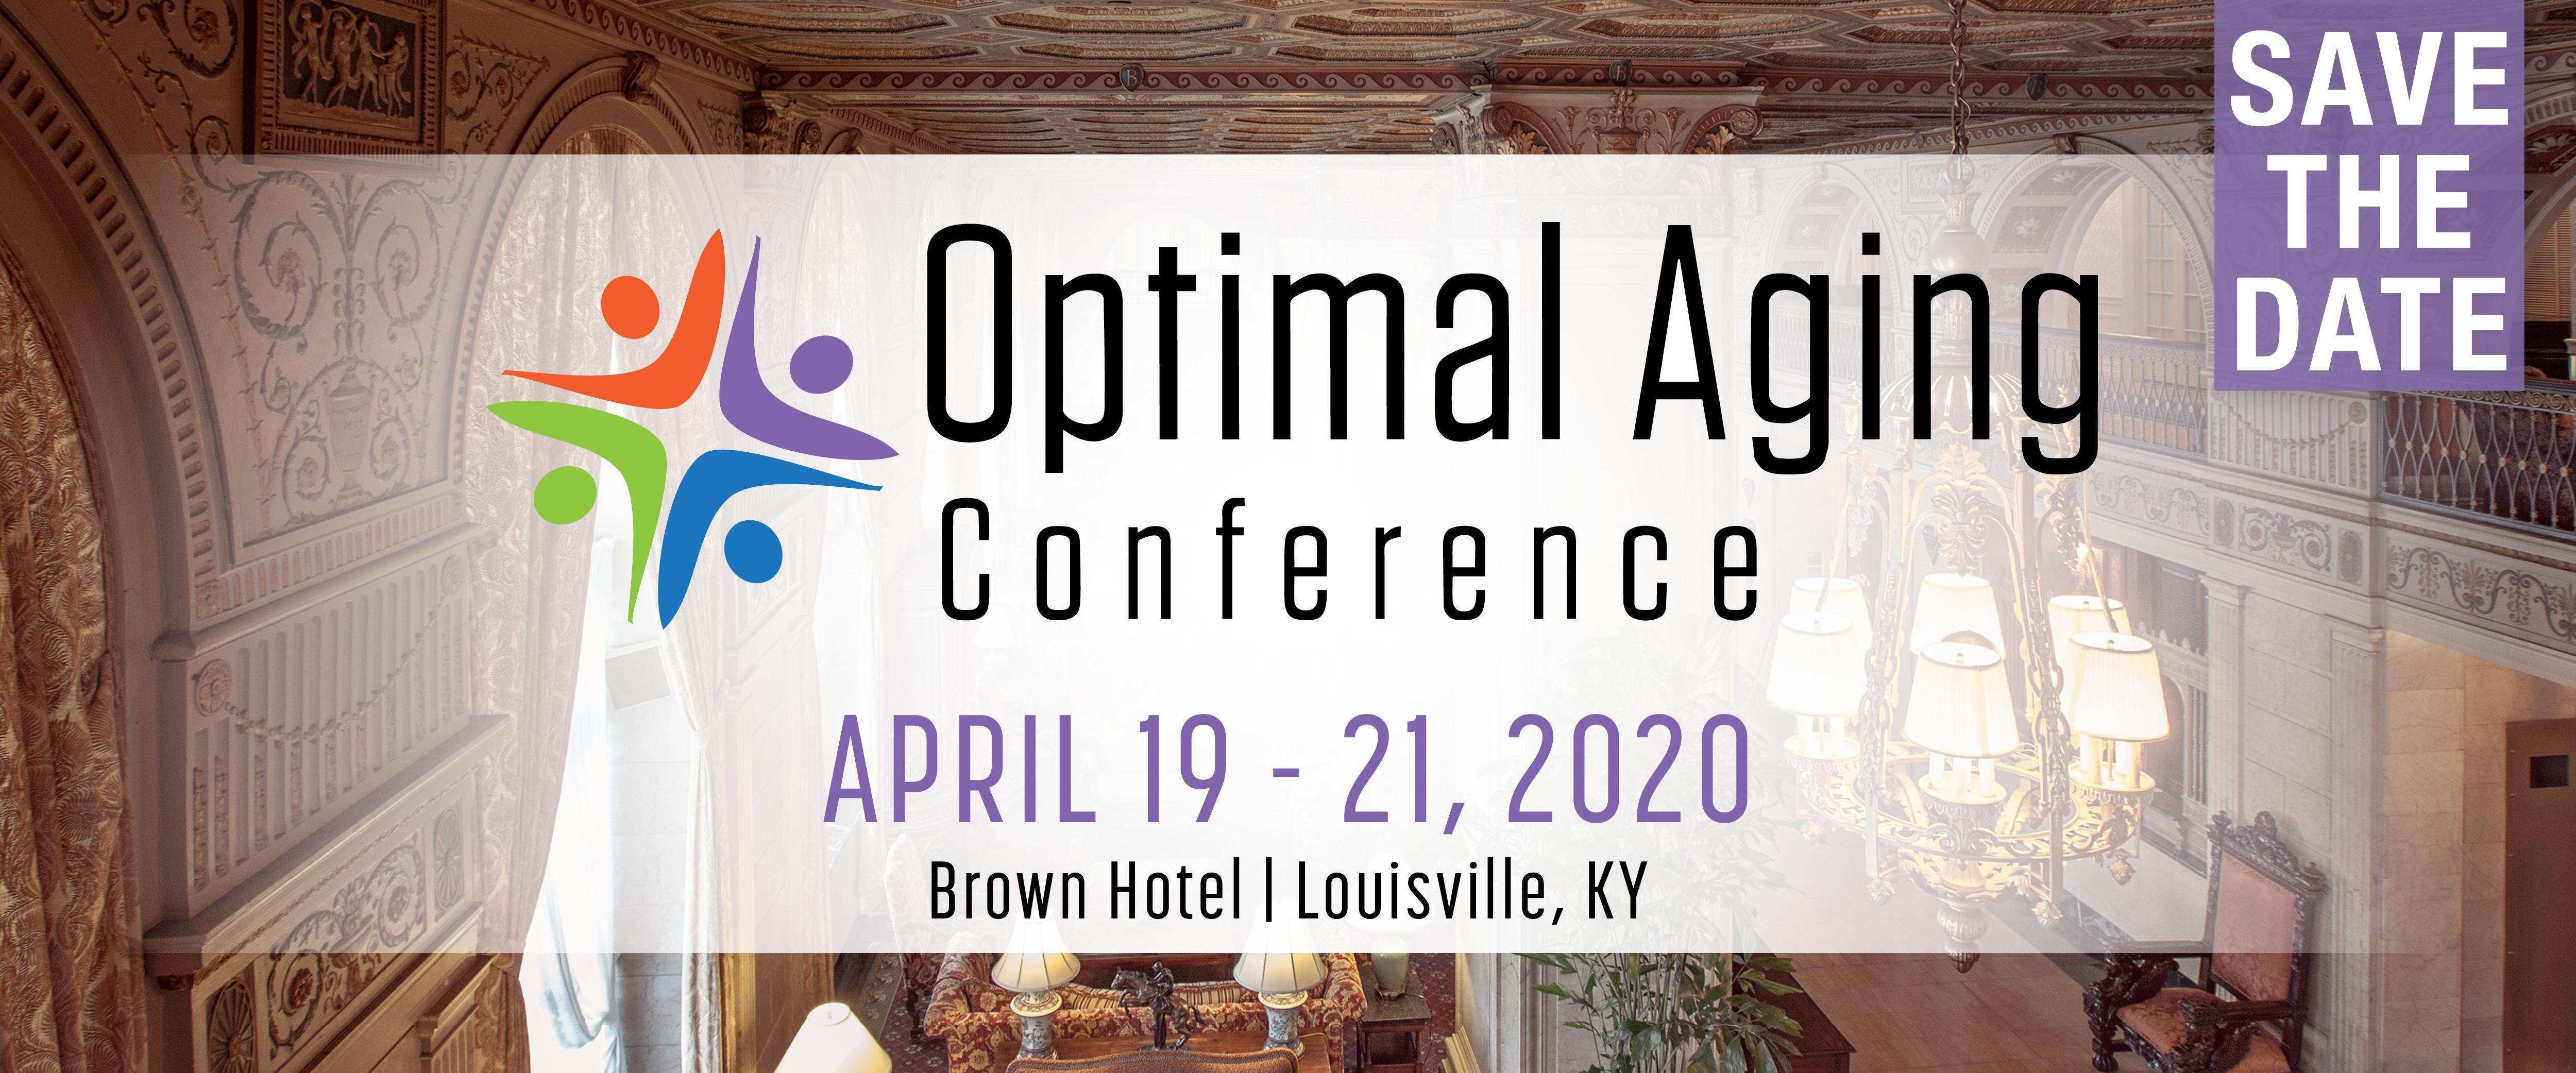 University Of Louisville Calendar 2020 Conference 2020